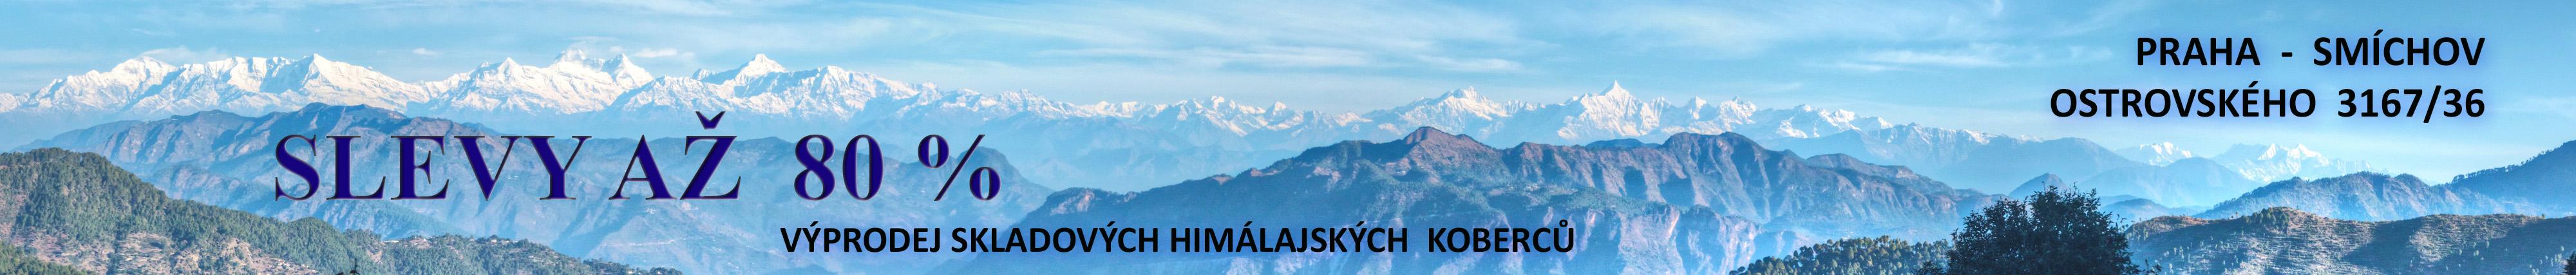 Palacka - velký výprodej himálajských koberců na Ostrovského 36 - Praha - Smíchov